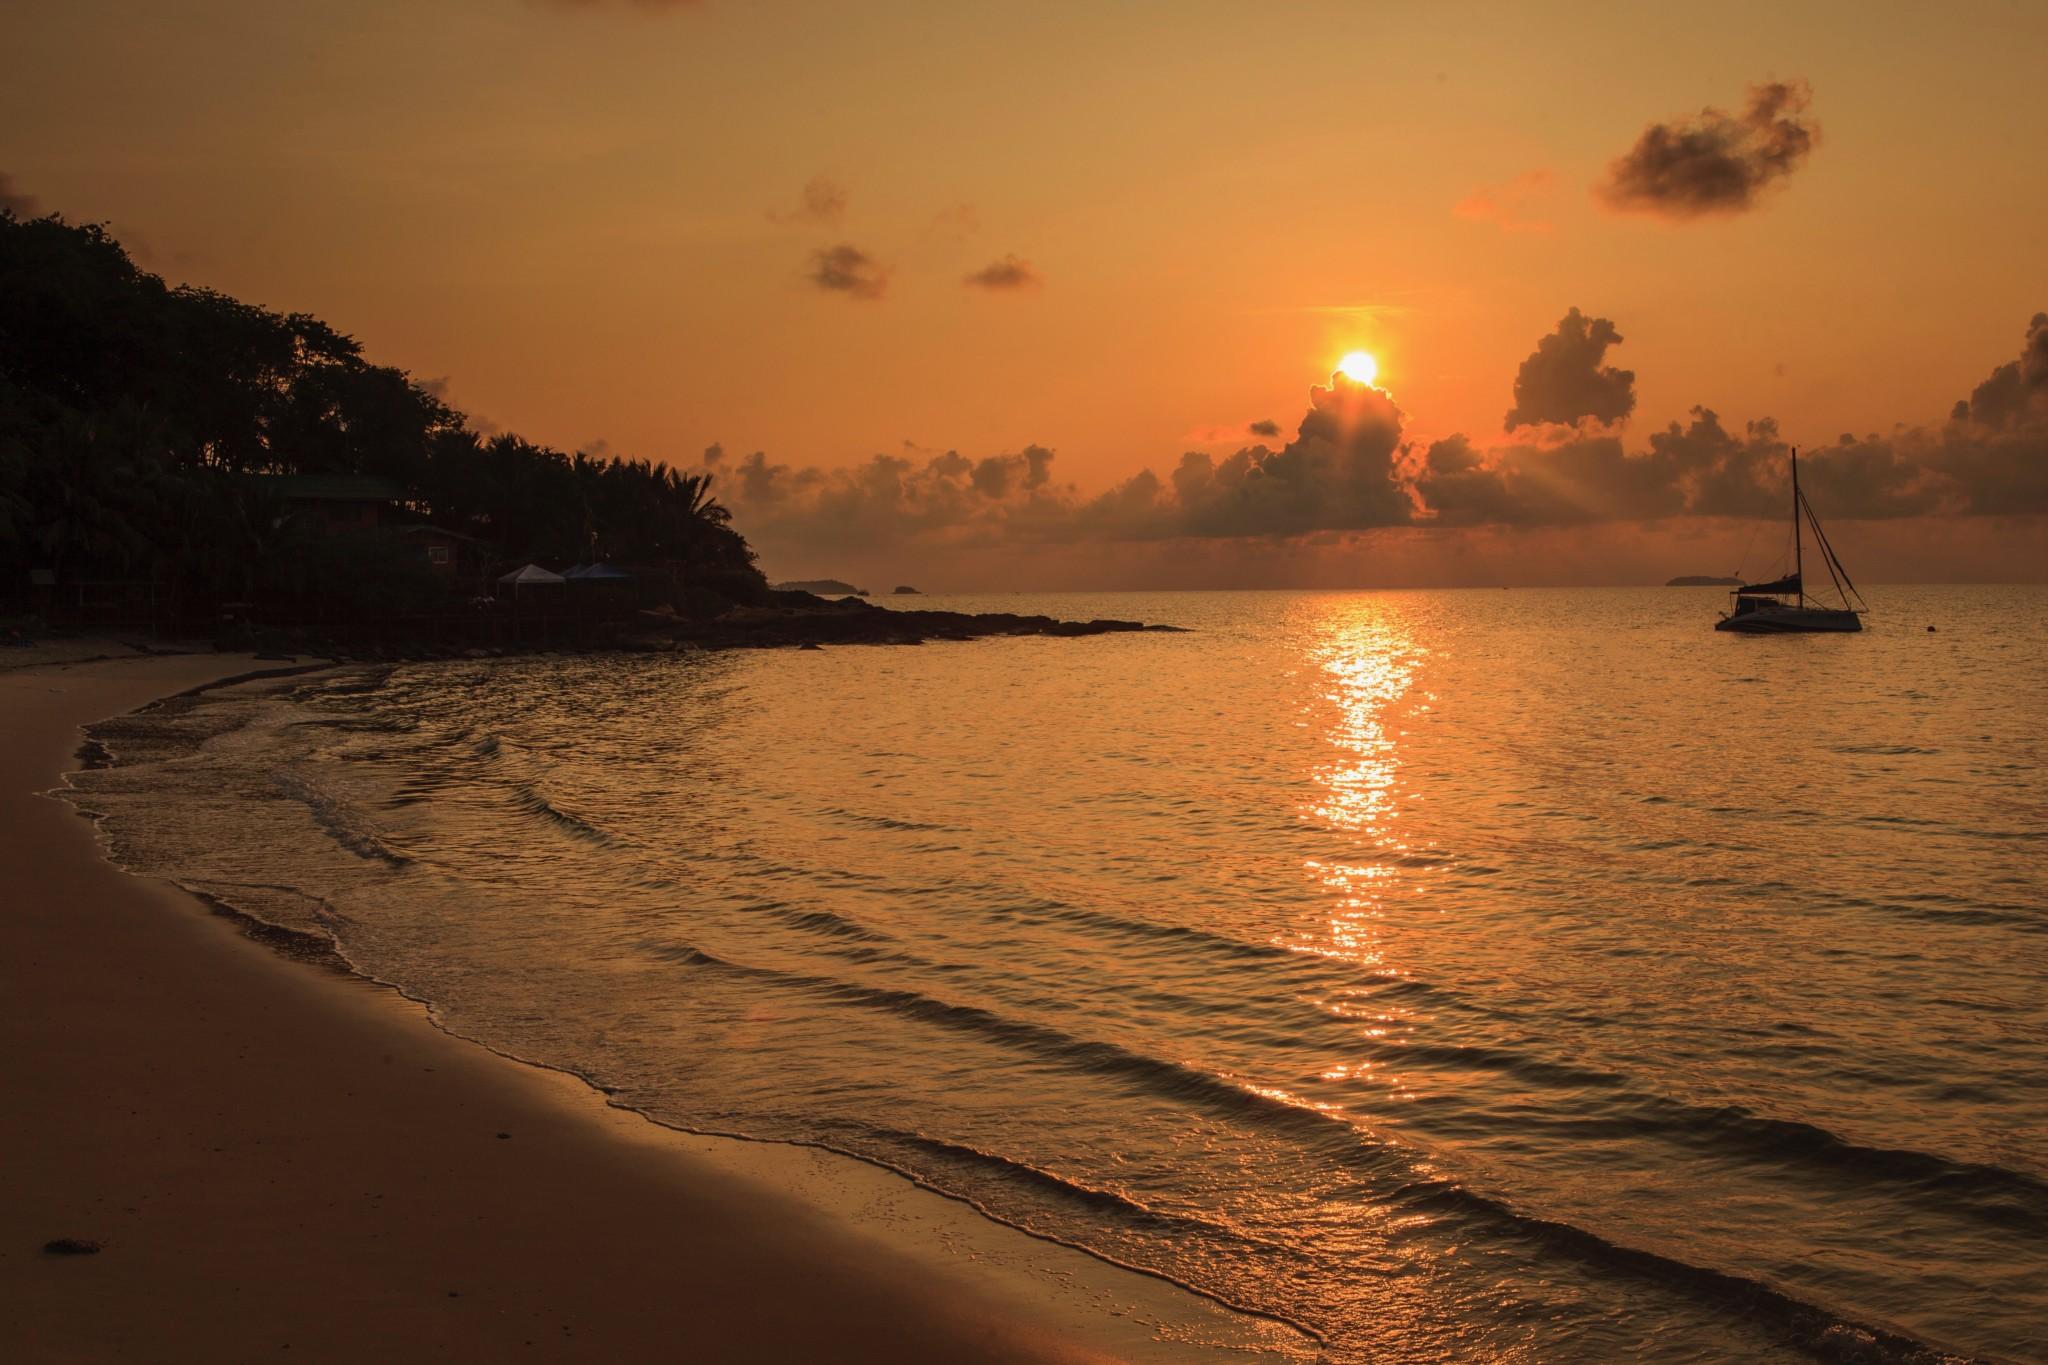 Sonnenuntergang in Koh Samet